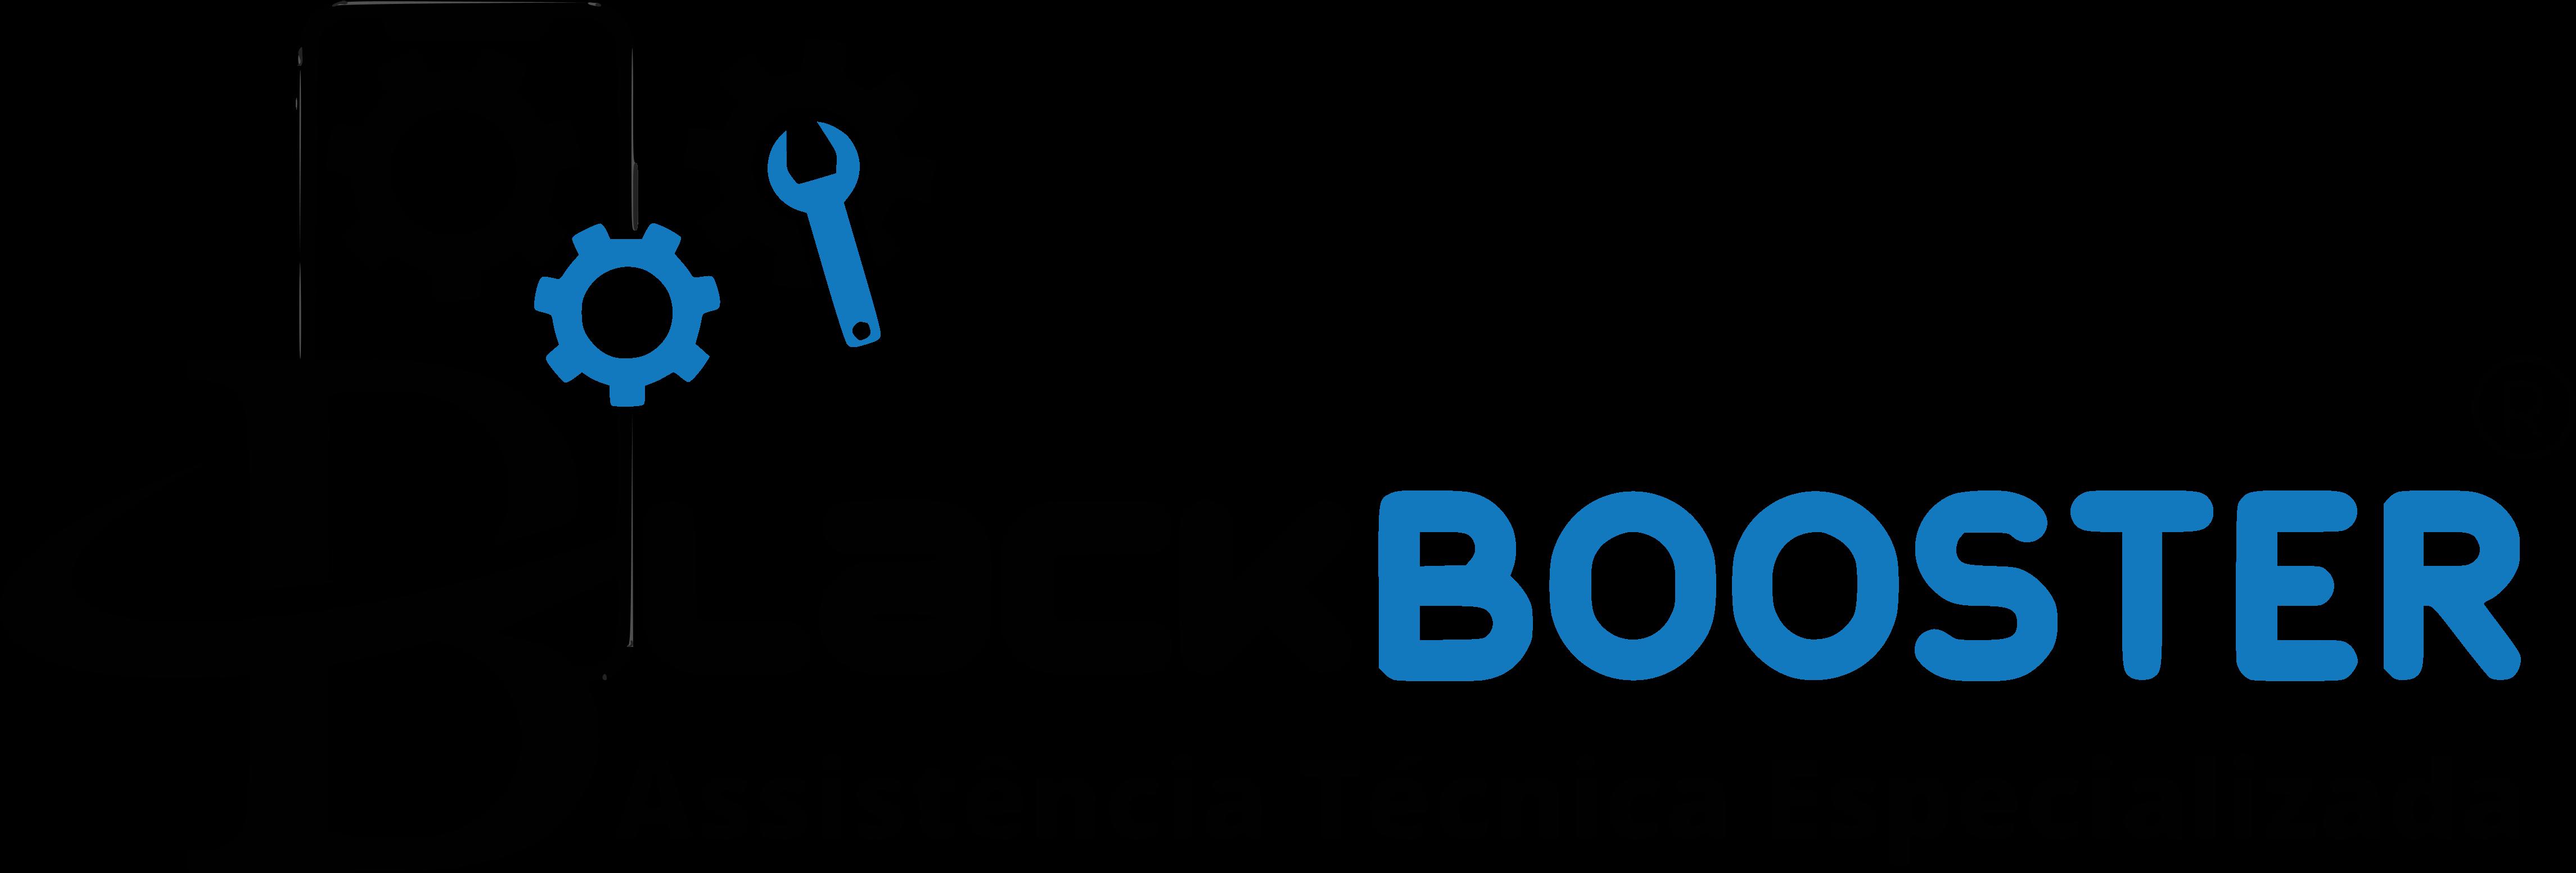 logo-transparente-blackbooster